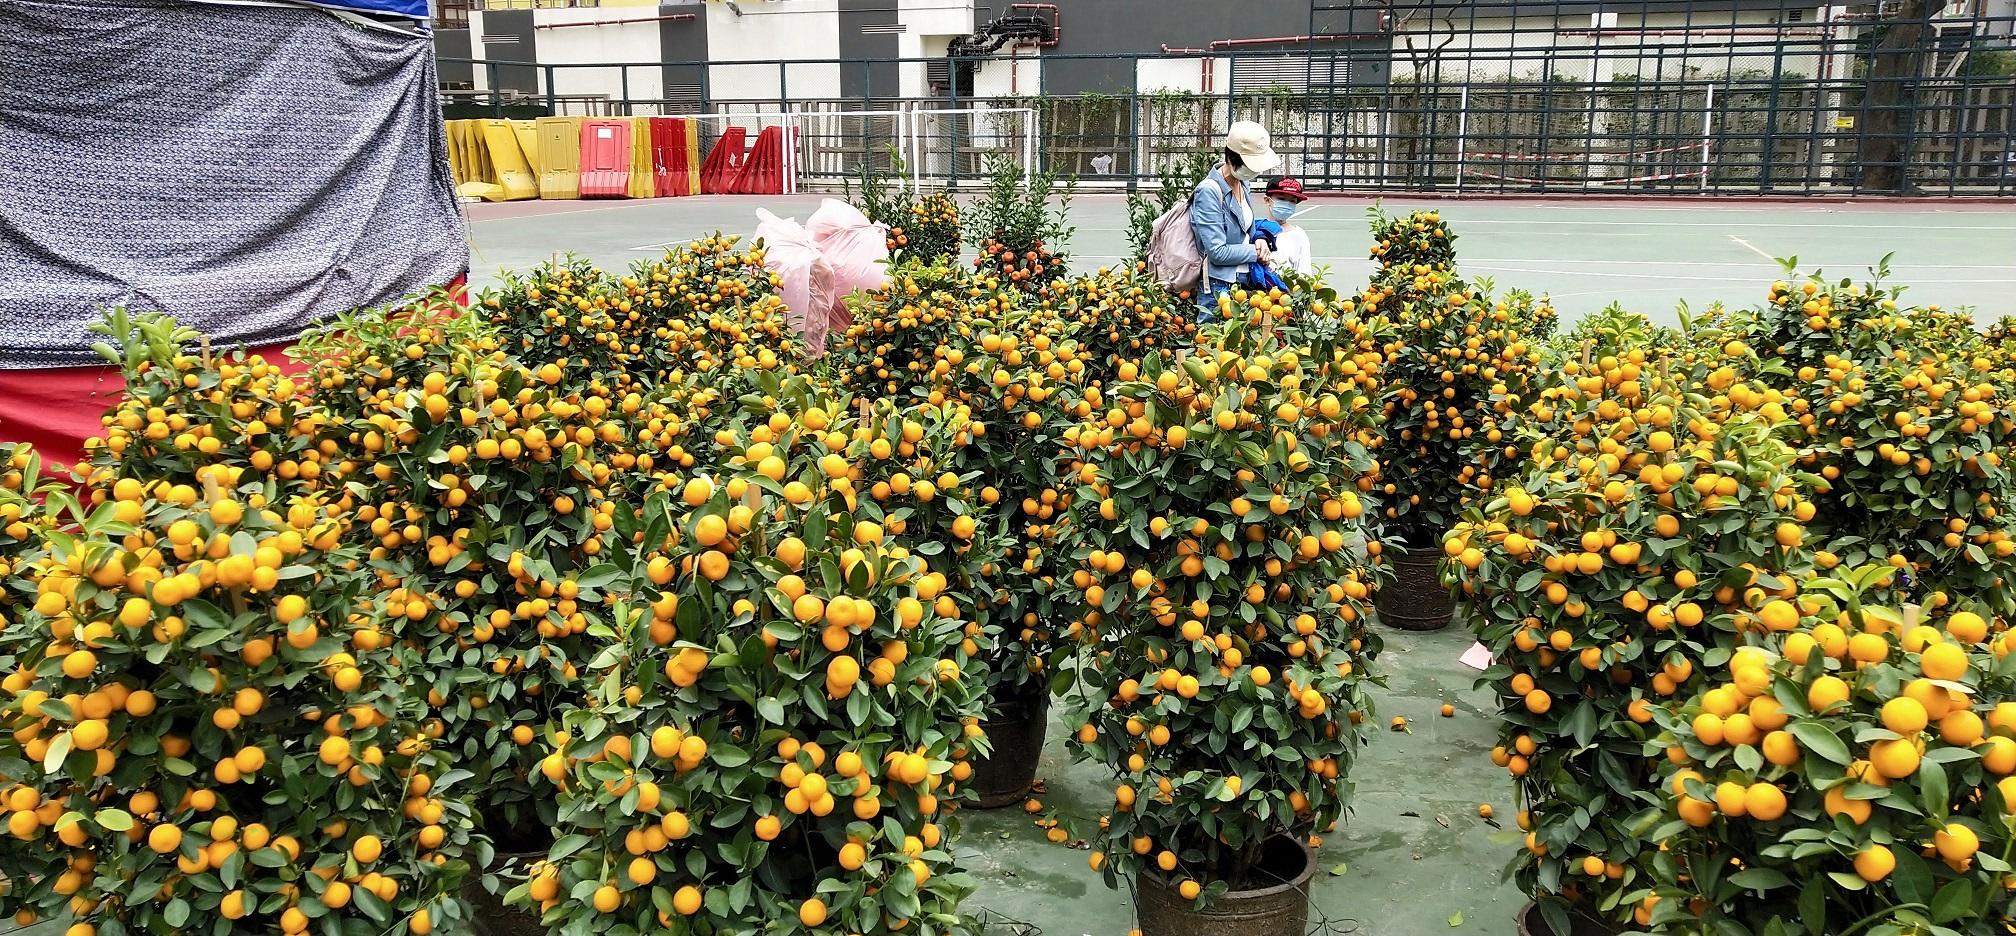 Customers are choosing Panama Oranges